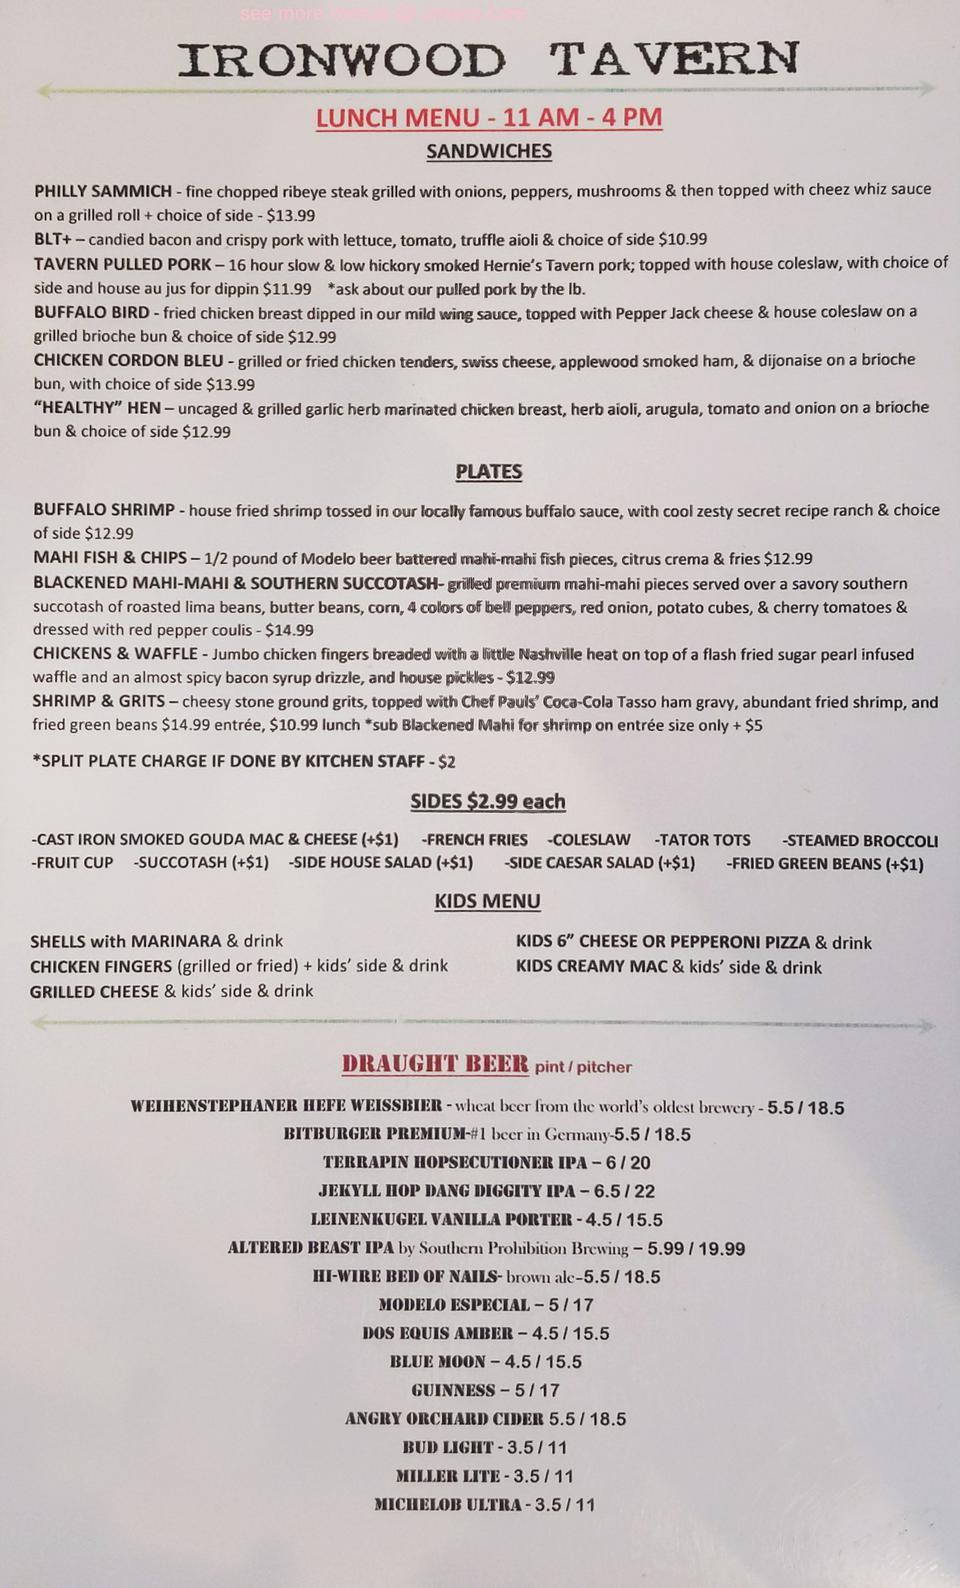 Online Menu Of Ironwood Tavern Restaurant Evans Georgia 30809 Zmenu